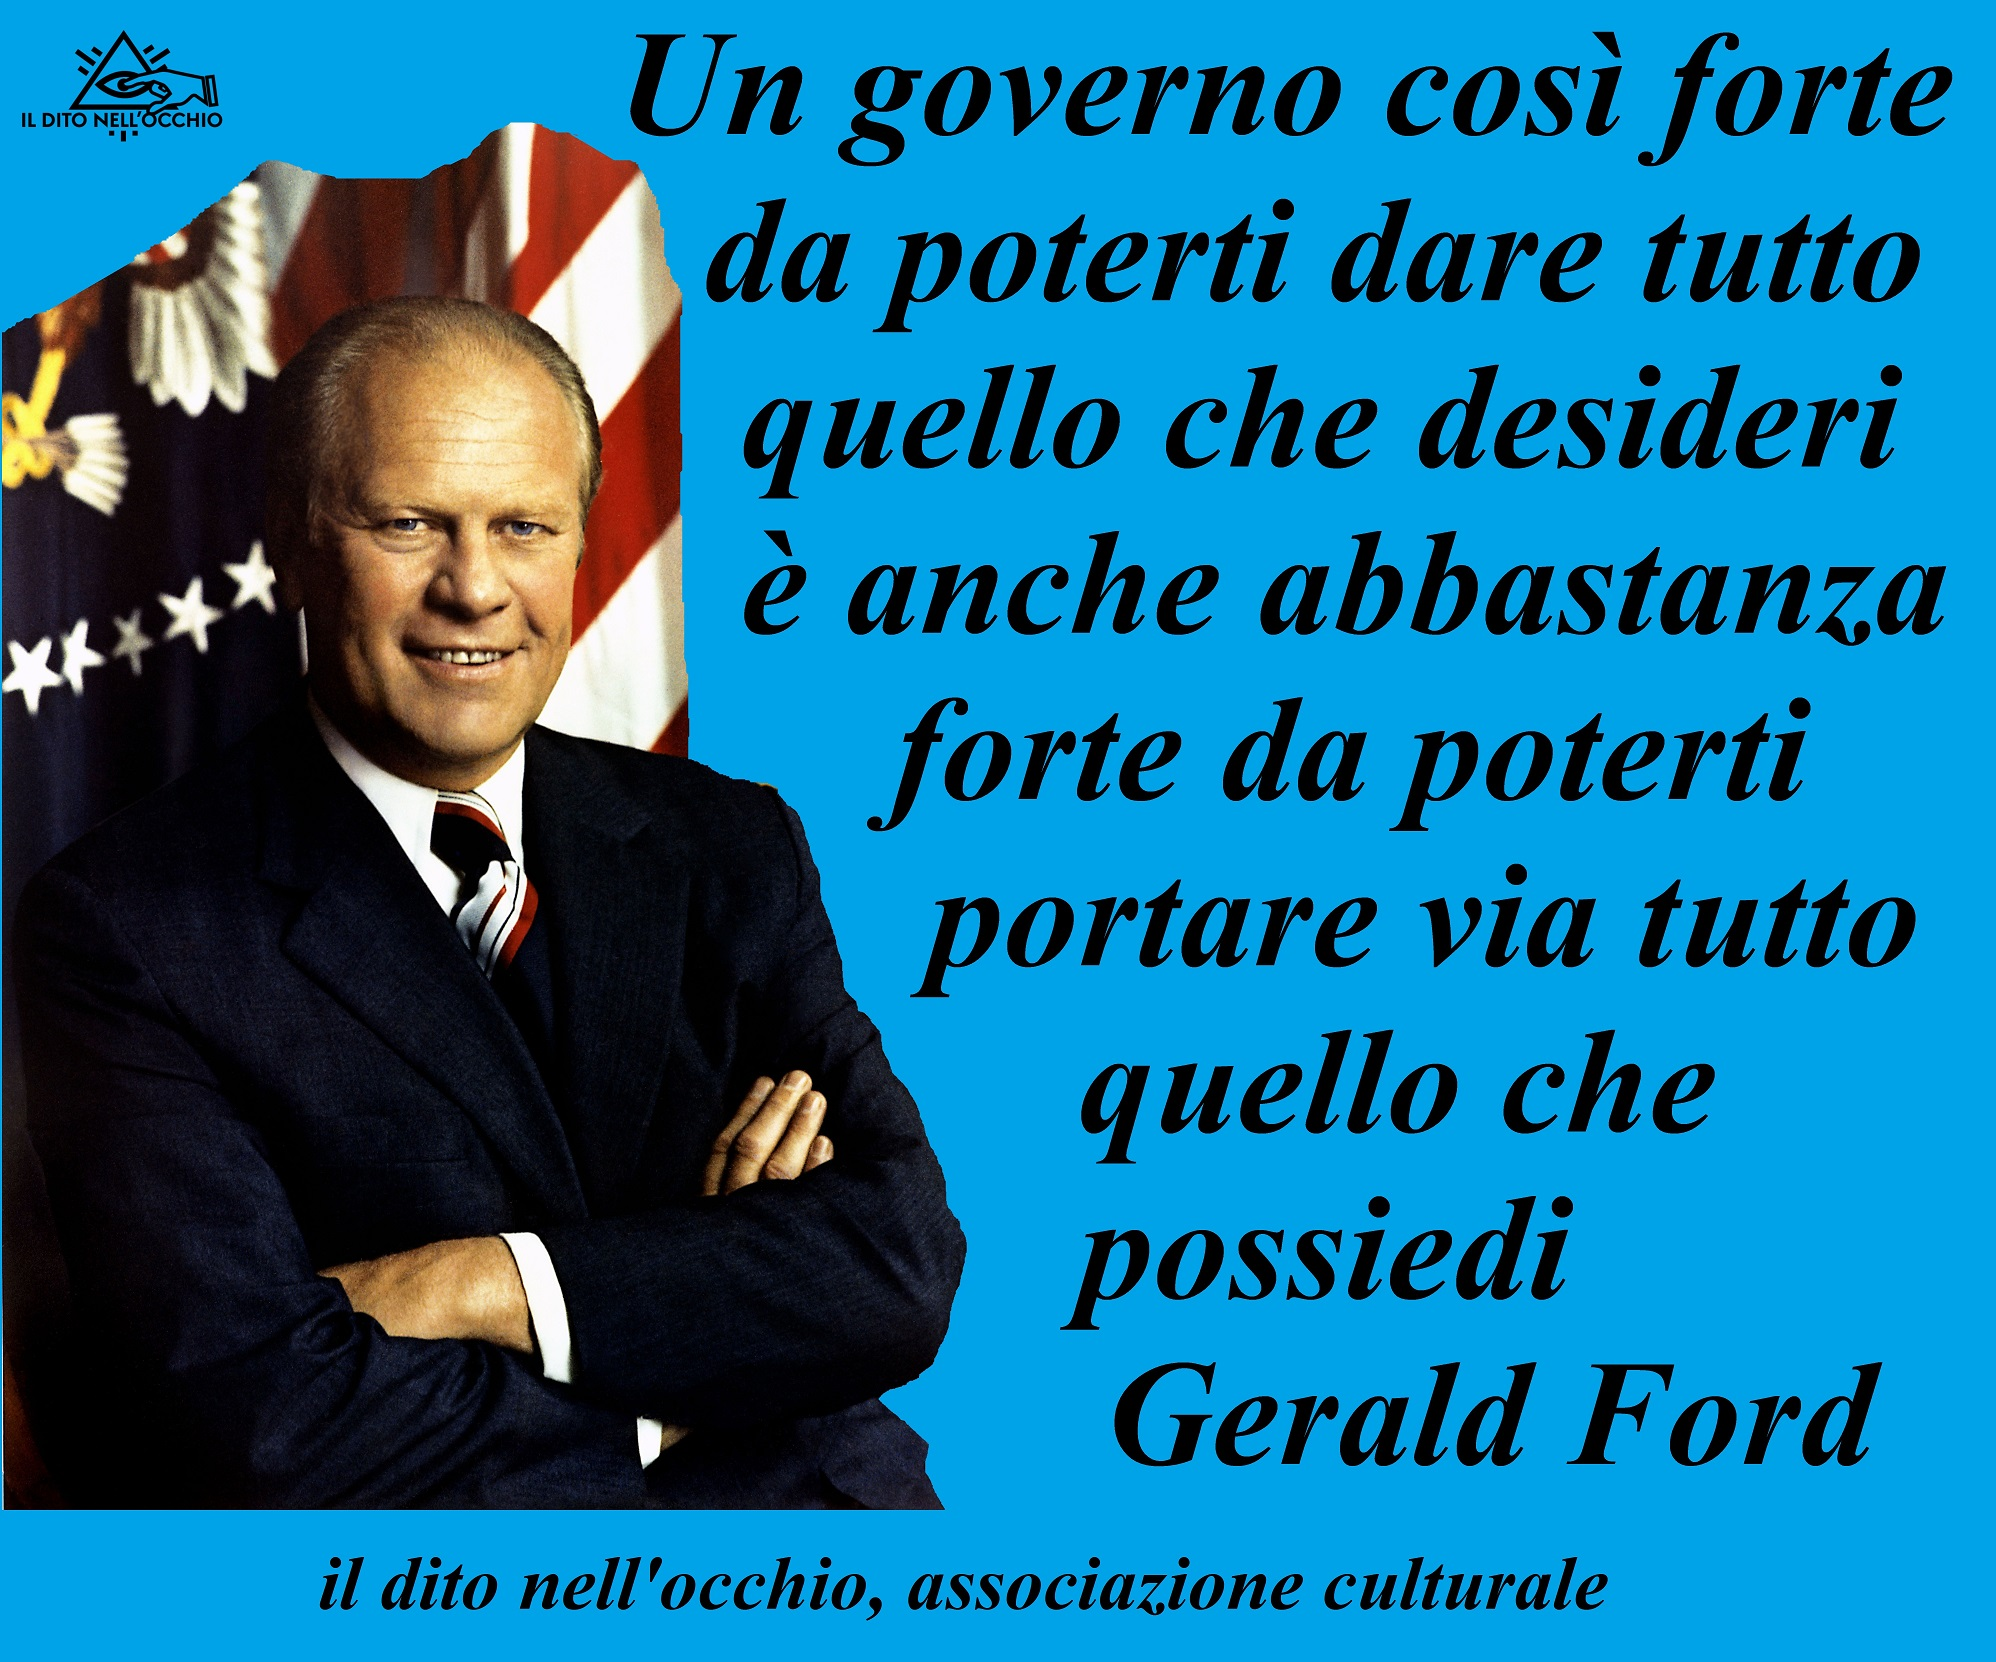 Gerald Ford Jr